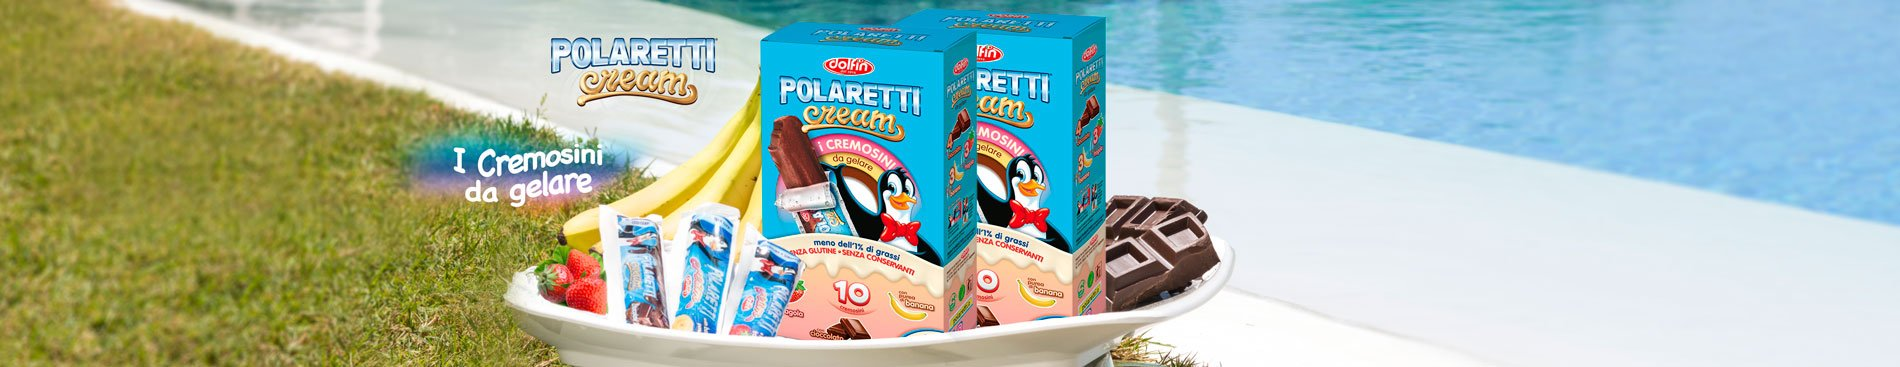 2019 Polaretti Cream